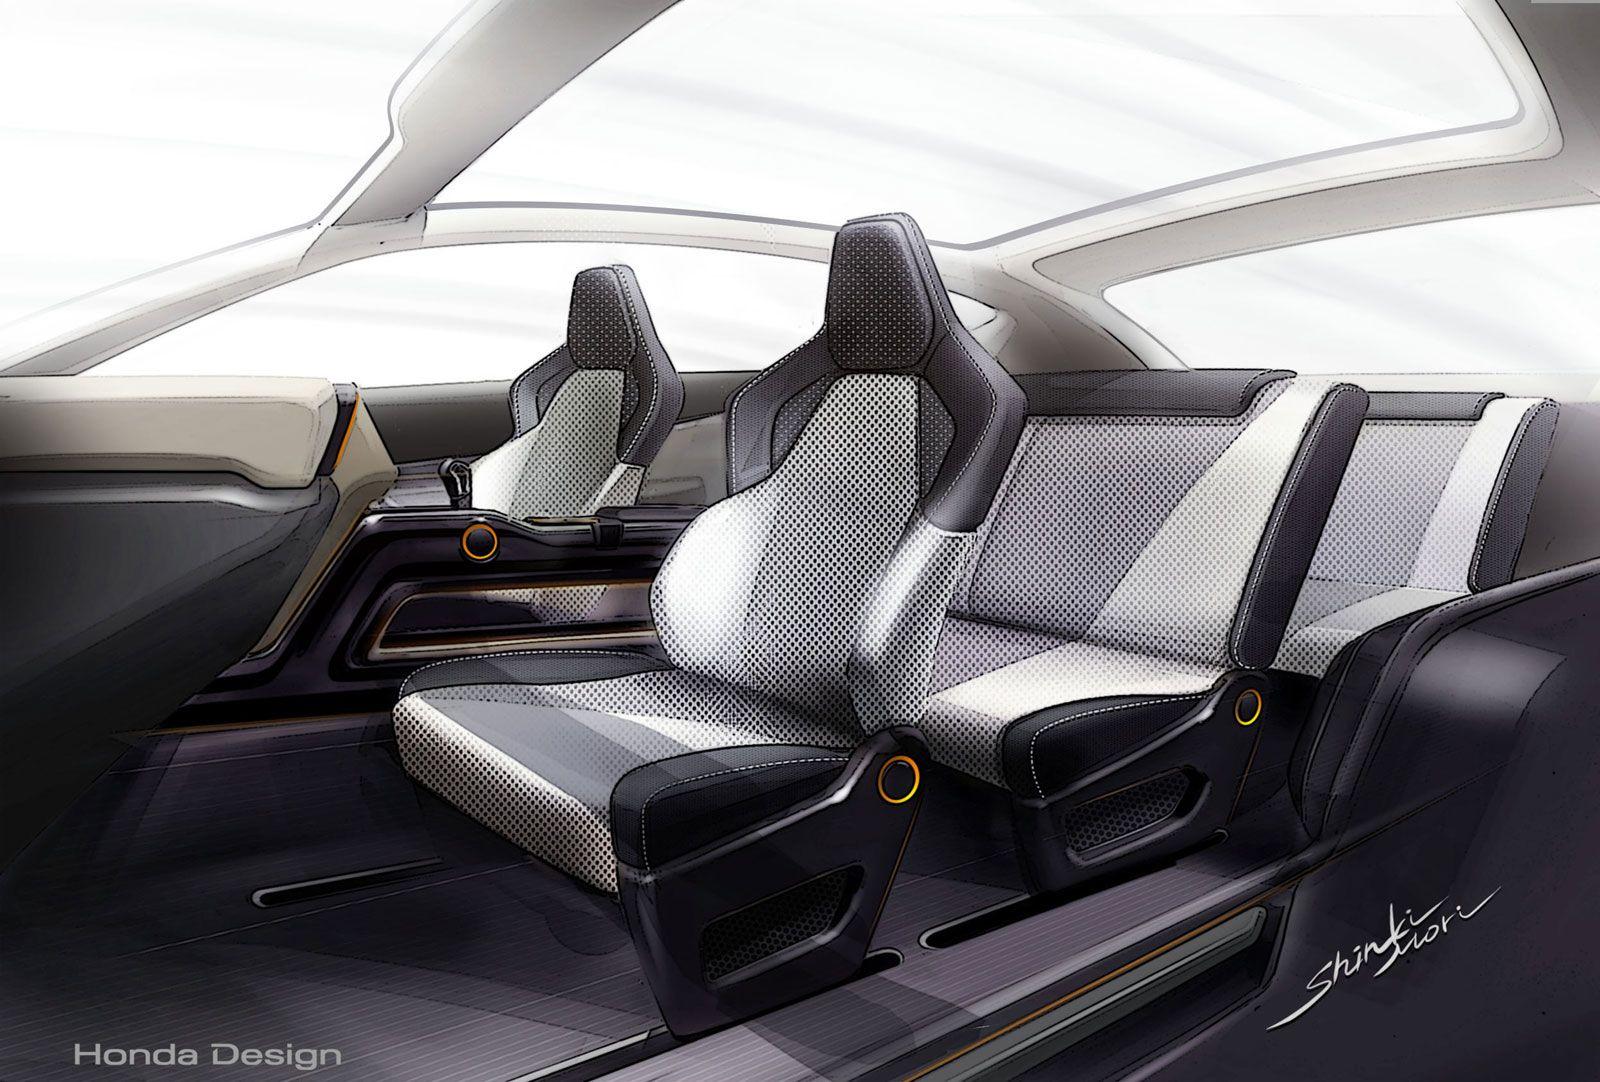 Honda Vision Xs 1 Concept Automotive Interior Sketches Pinterest